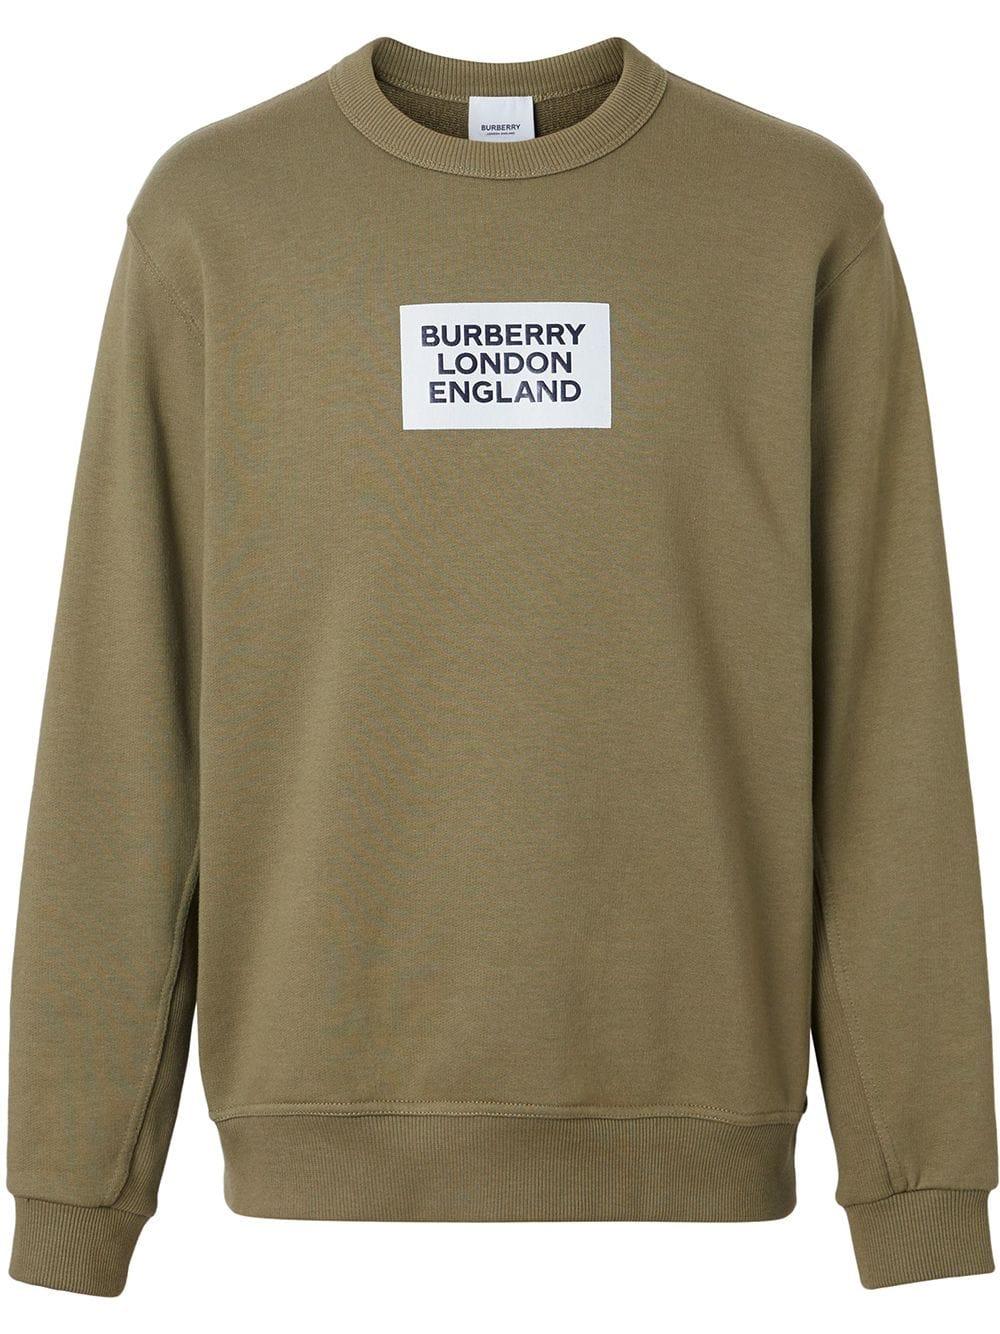 Burberry T Shirts Burberry Logo Print Cotton Sweatshirt Green Burberry T Shirts Cotton Sweatshirts Sweatshirts Mens Sweatshirts [ 1334 x 1000 Pixel ]